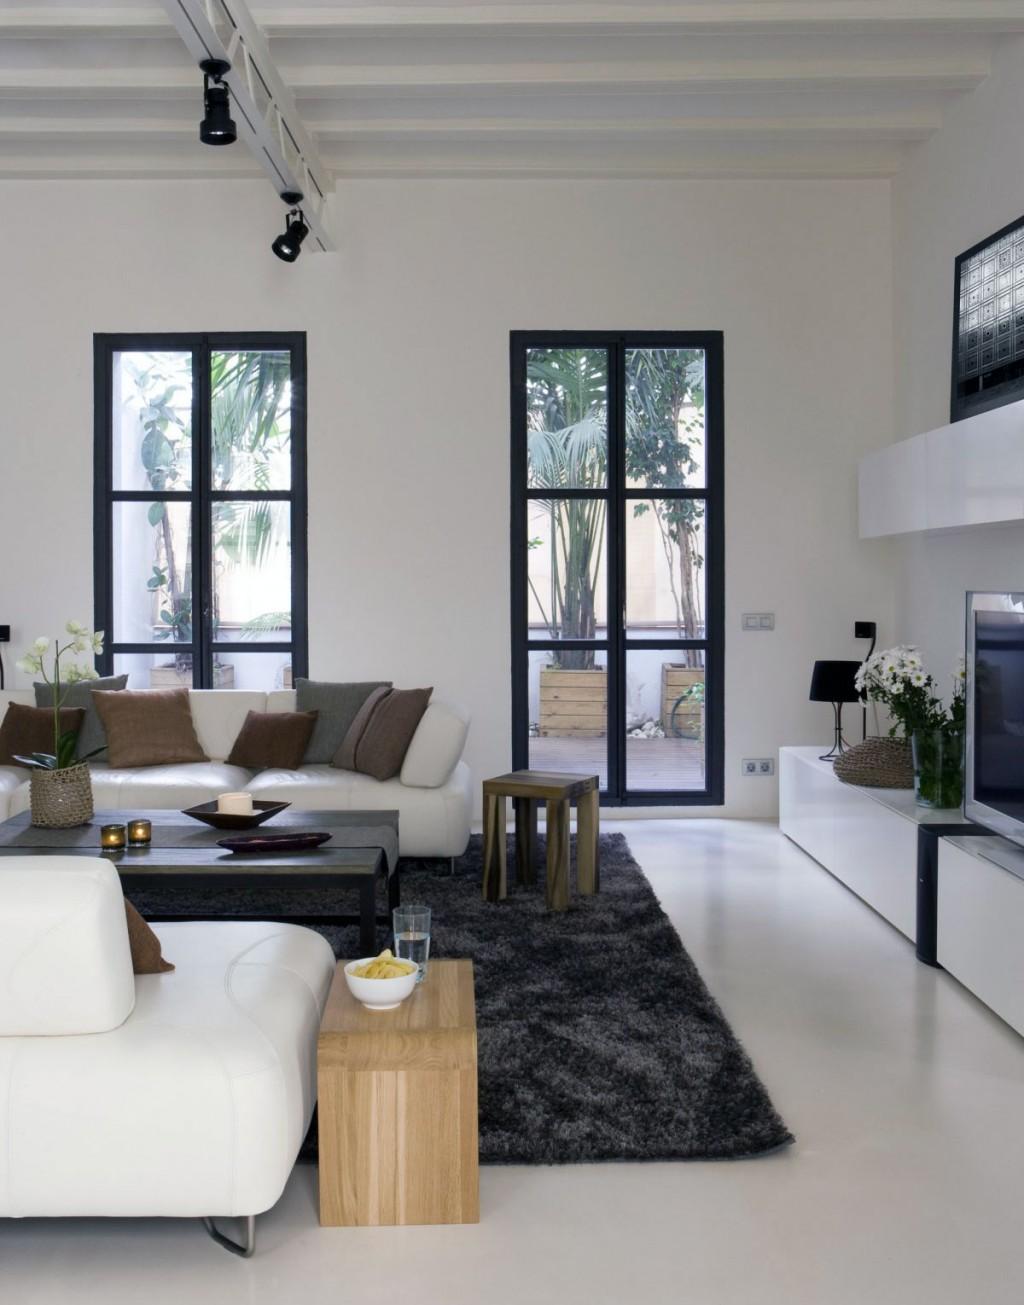 Modern And Minimalist Apartment Interior Designs That Will ... on Minimalist Room Design  id=73822